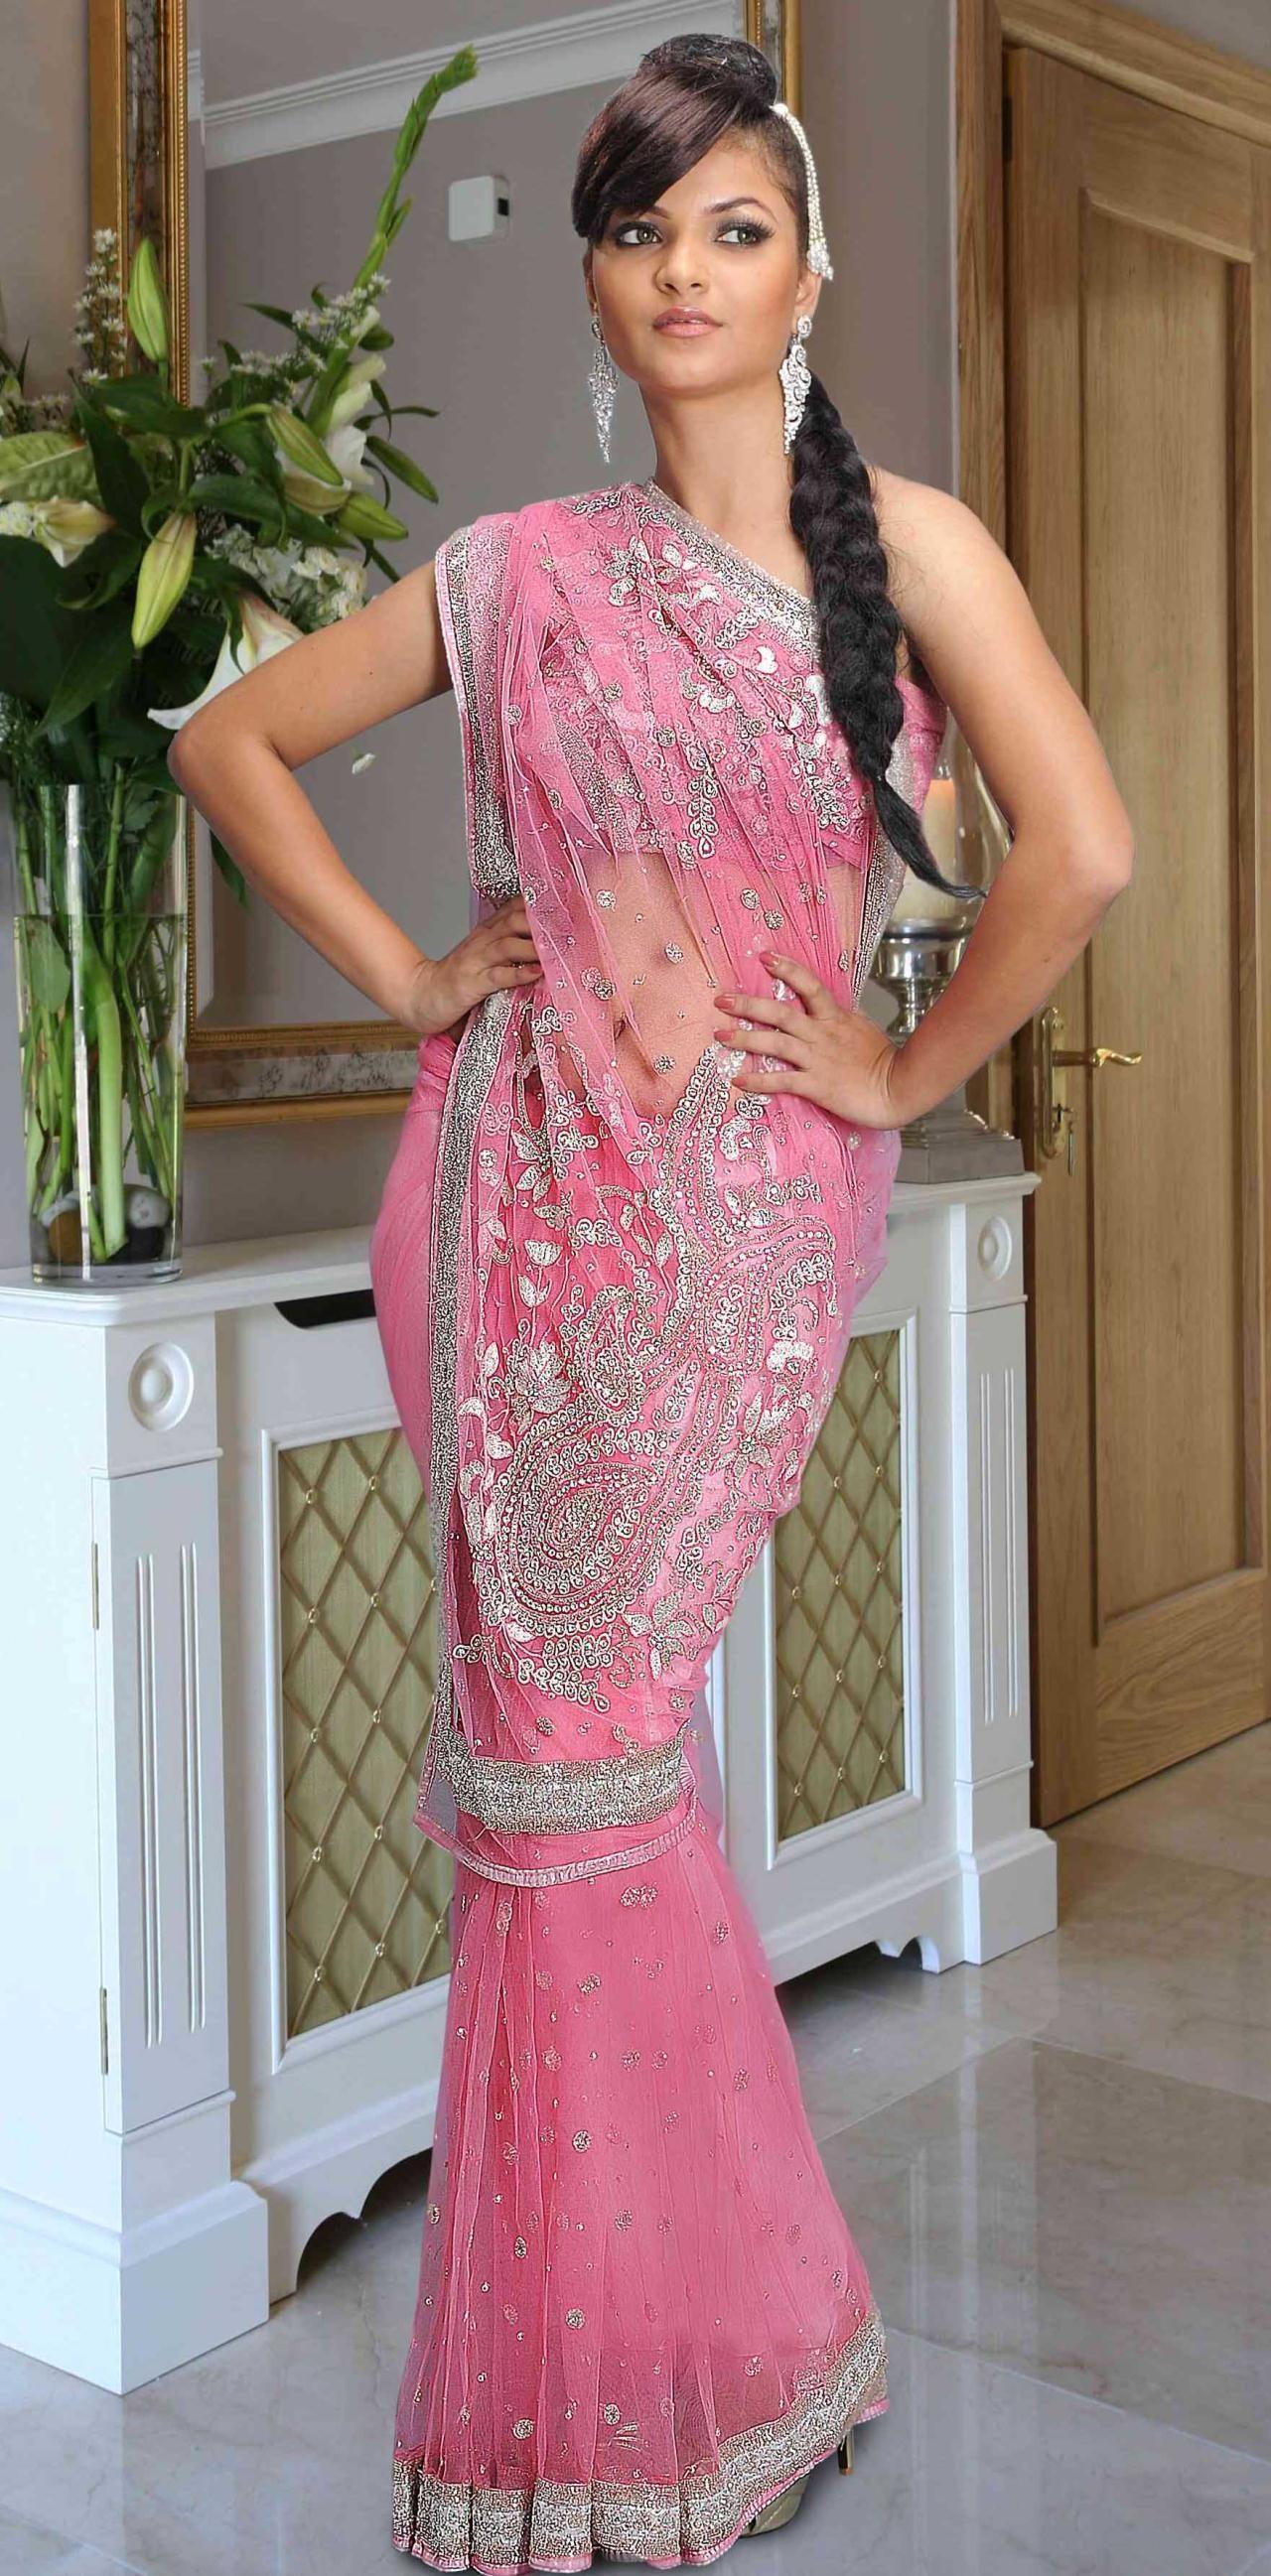 Net saree images pink net saree  with unstitched blouse  net saree  pinterest